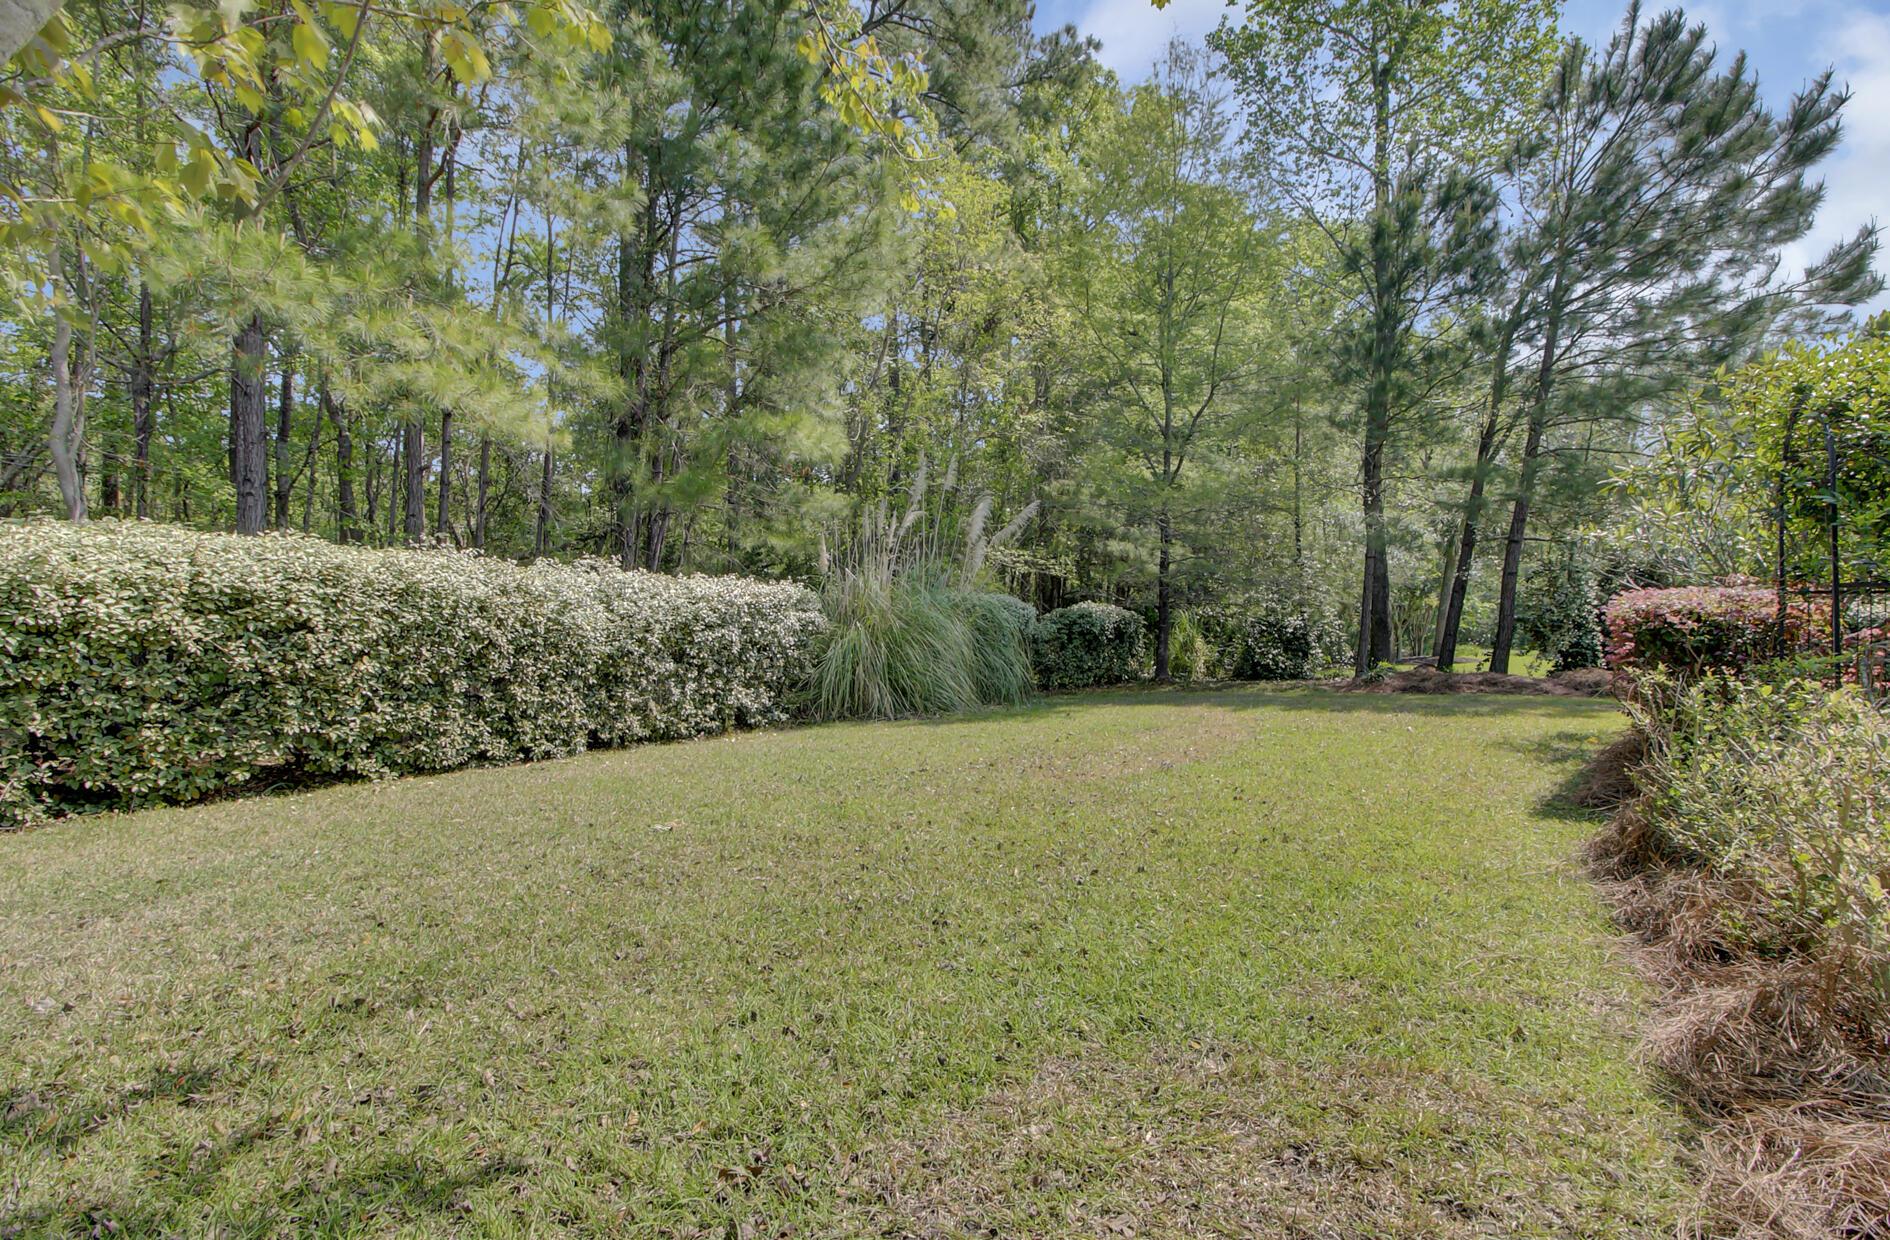 Marsh Cove Homes For Sale - 2928 Riverwood, Mount Pleasant, SC - 1